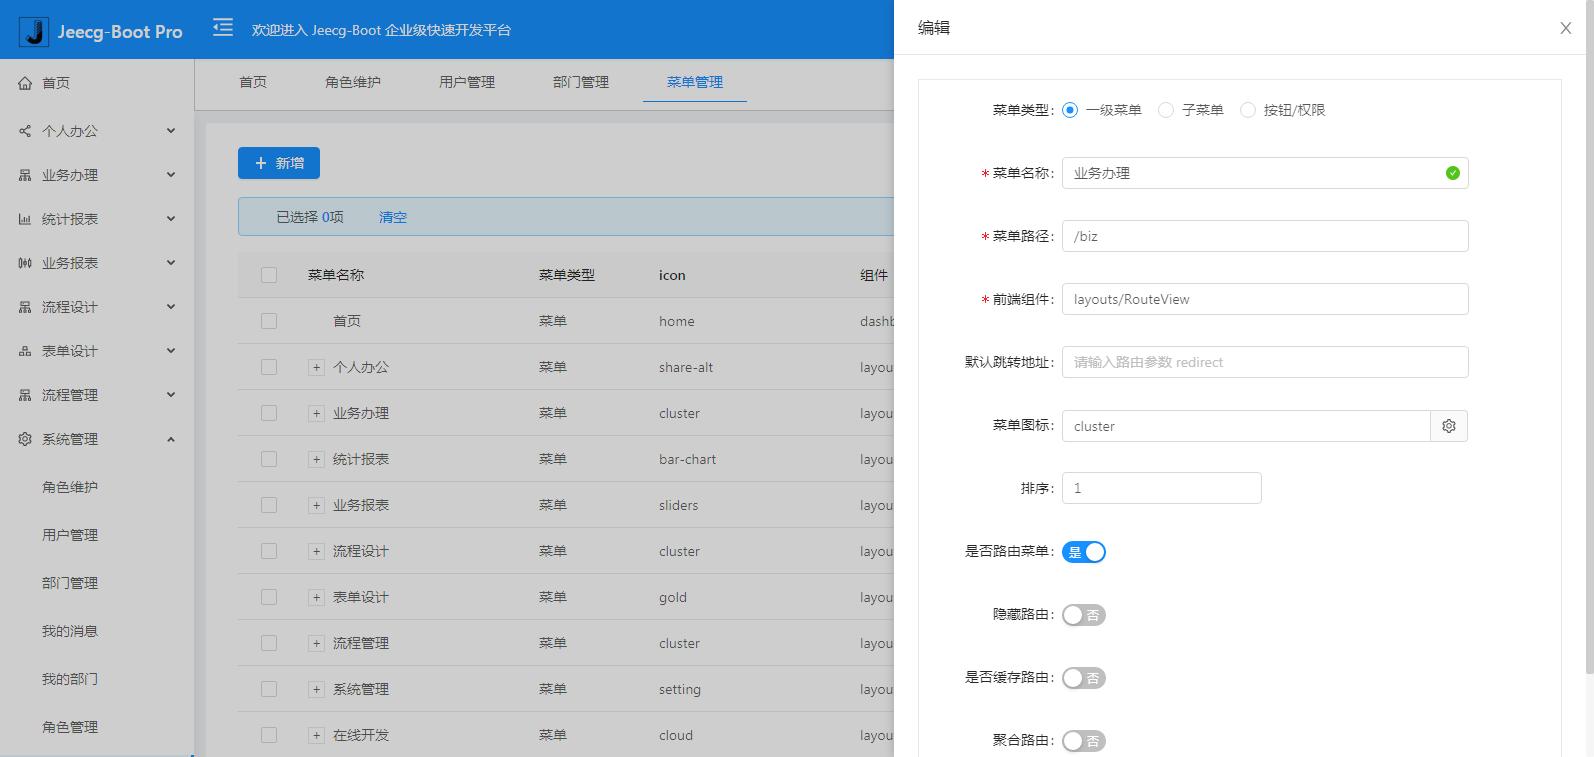 JeecgBoot 2.4.3版本发布,企业级低代码平台(图10)